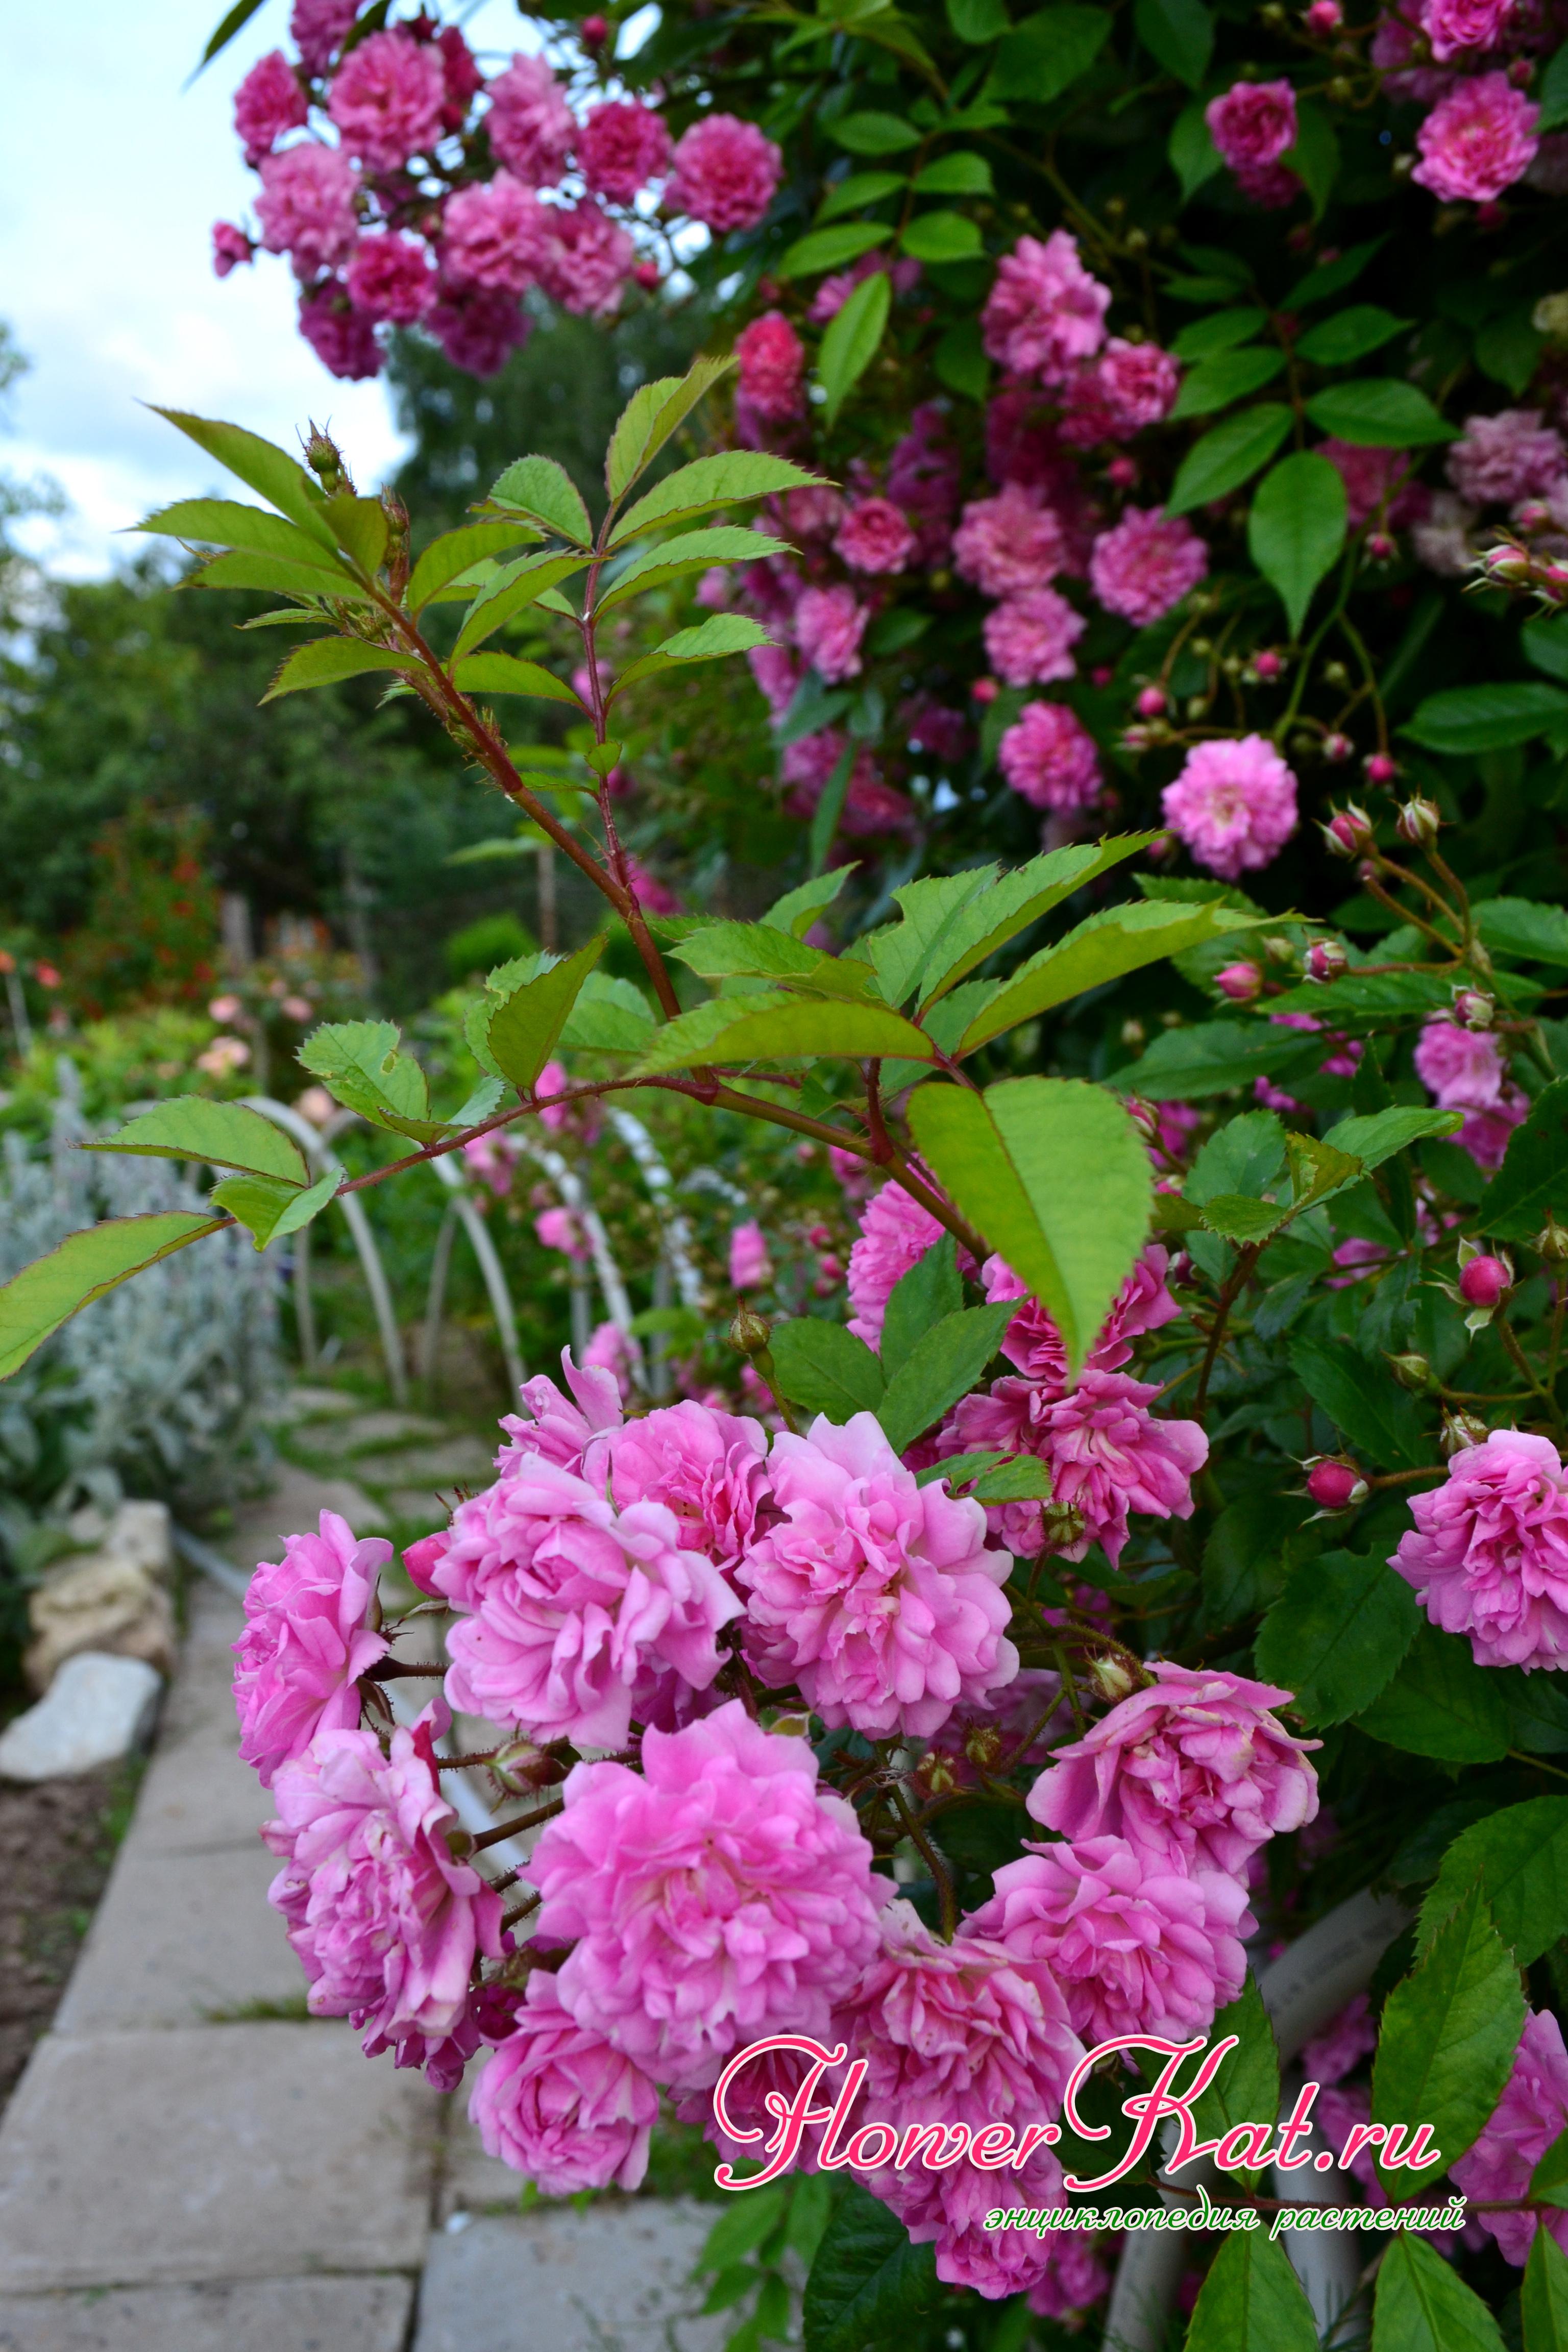 хорошо роза вартбург фото и описание для фотошопа